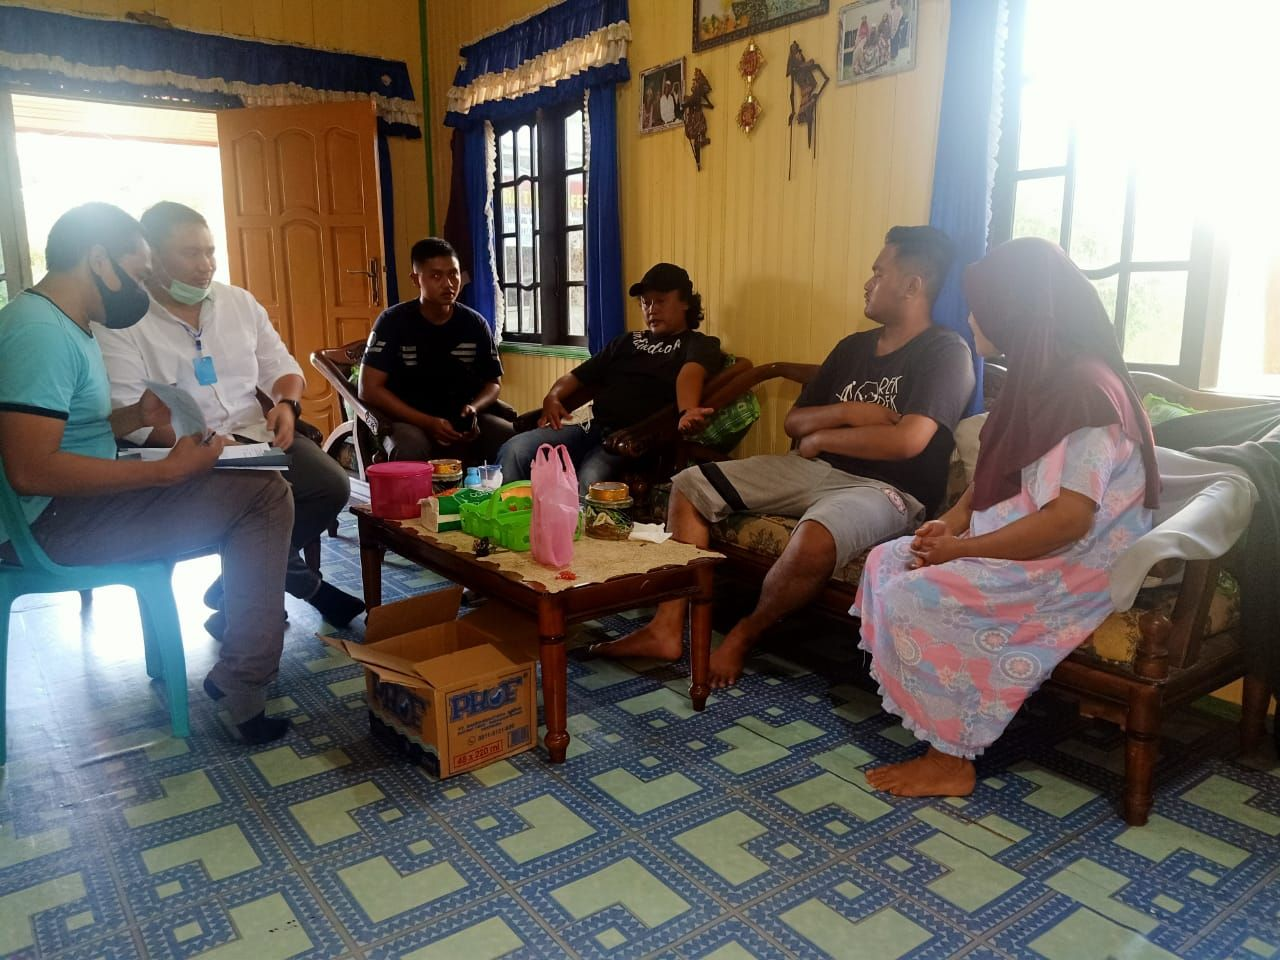 Gilang Aprilian atau yang dijuluki netizen 'Gilang Bungkus' ditangkap polisi di Kalimantan Tengah. Dia segera dibawa ke Surabaya.